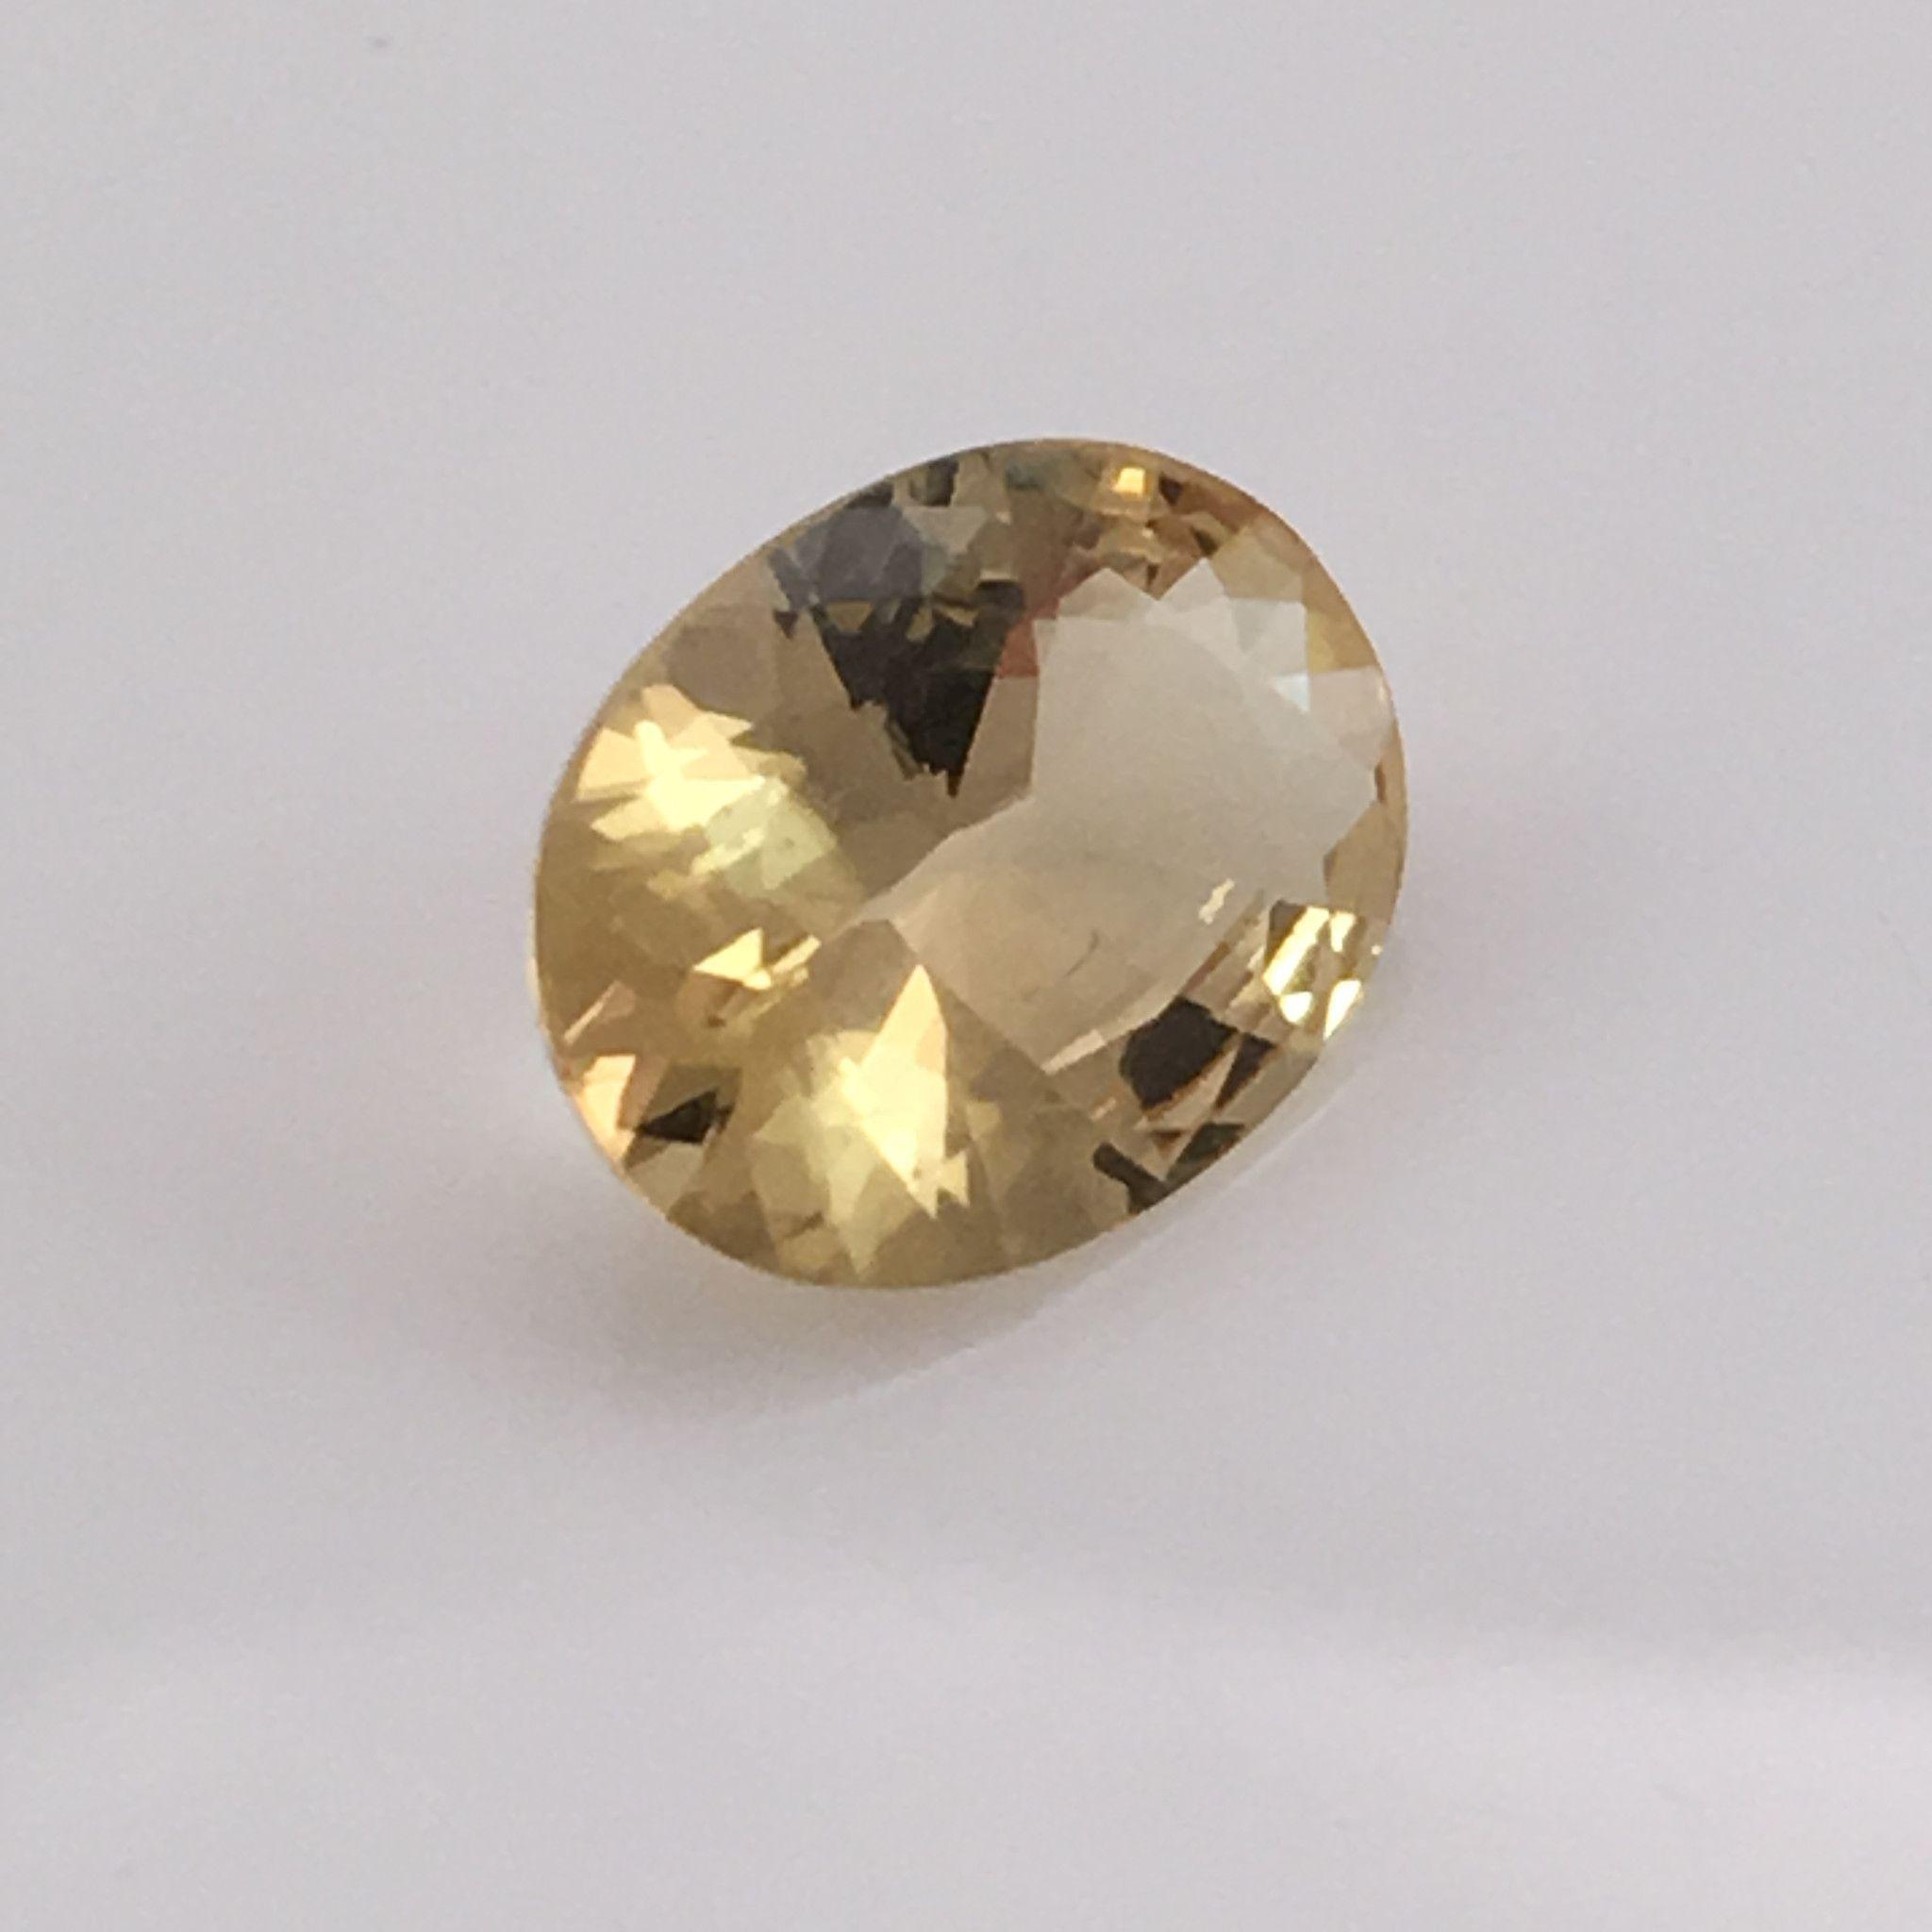 1.9 carat Golden Beryl Gemstone Gemstones, Golden beryl